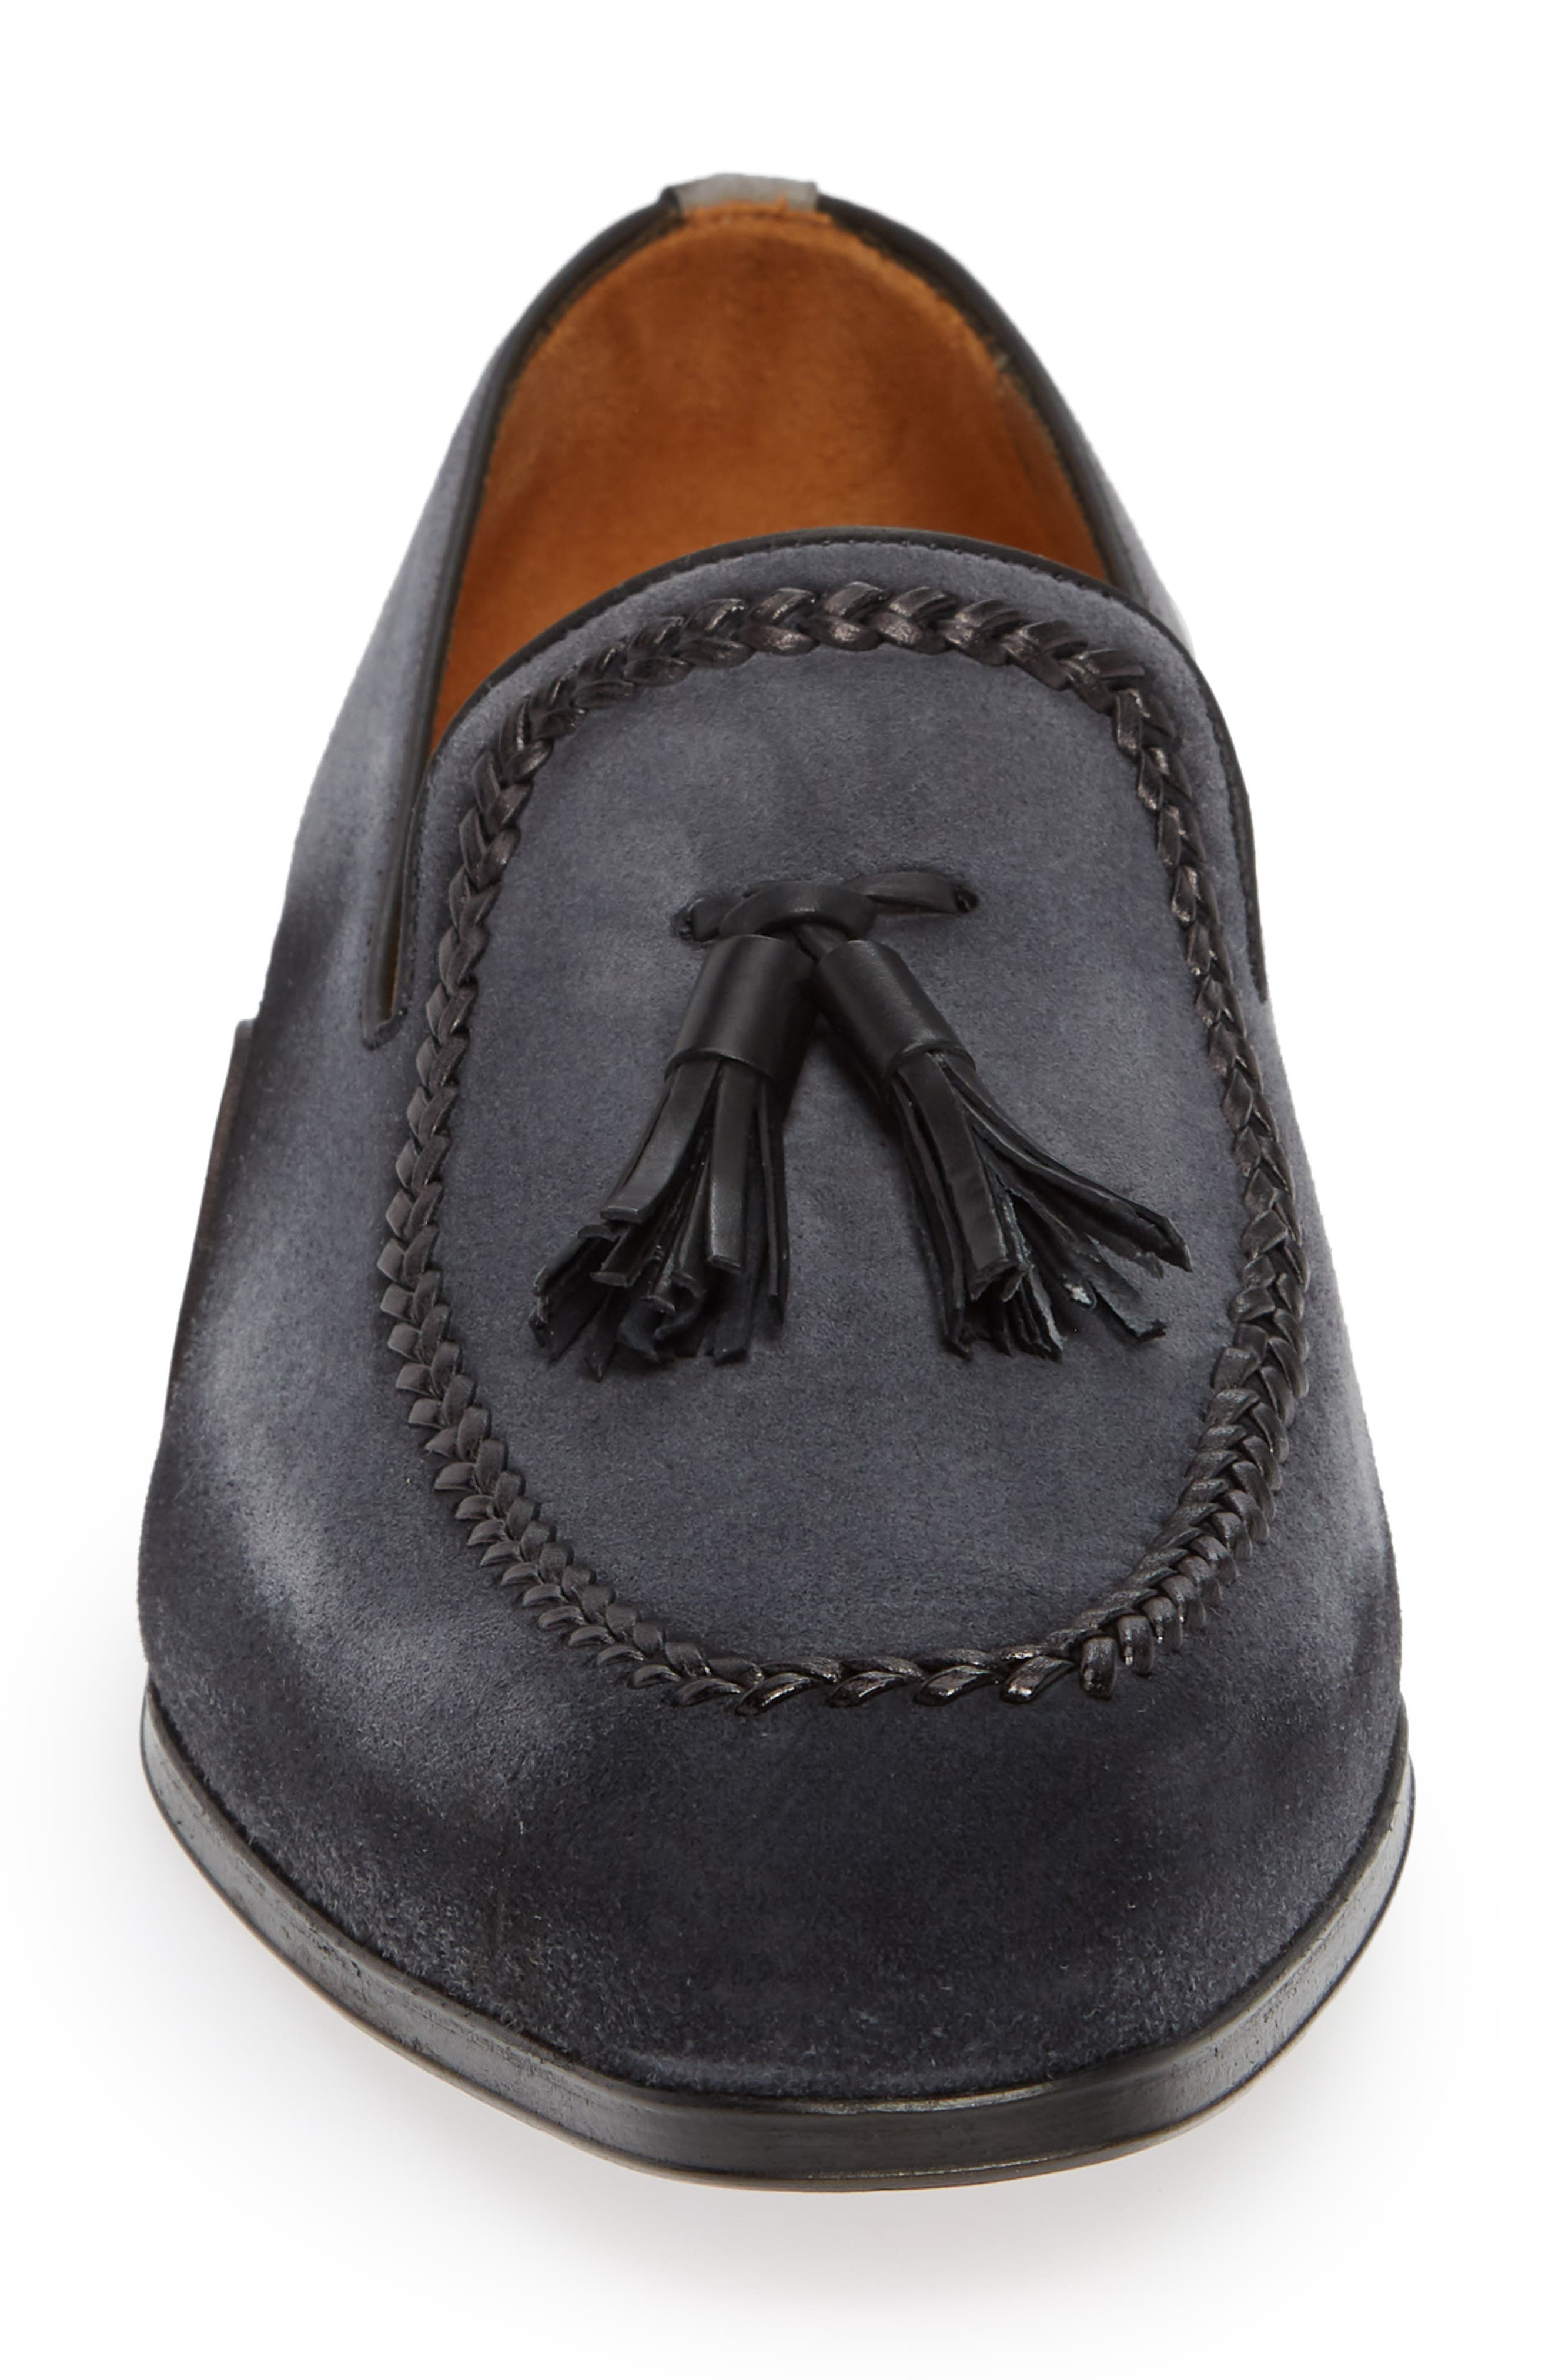 Plazza Tasseled Venetian Loafer,                             Alternate thumbnail 4, color,                             GREY SUEDE